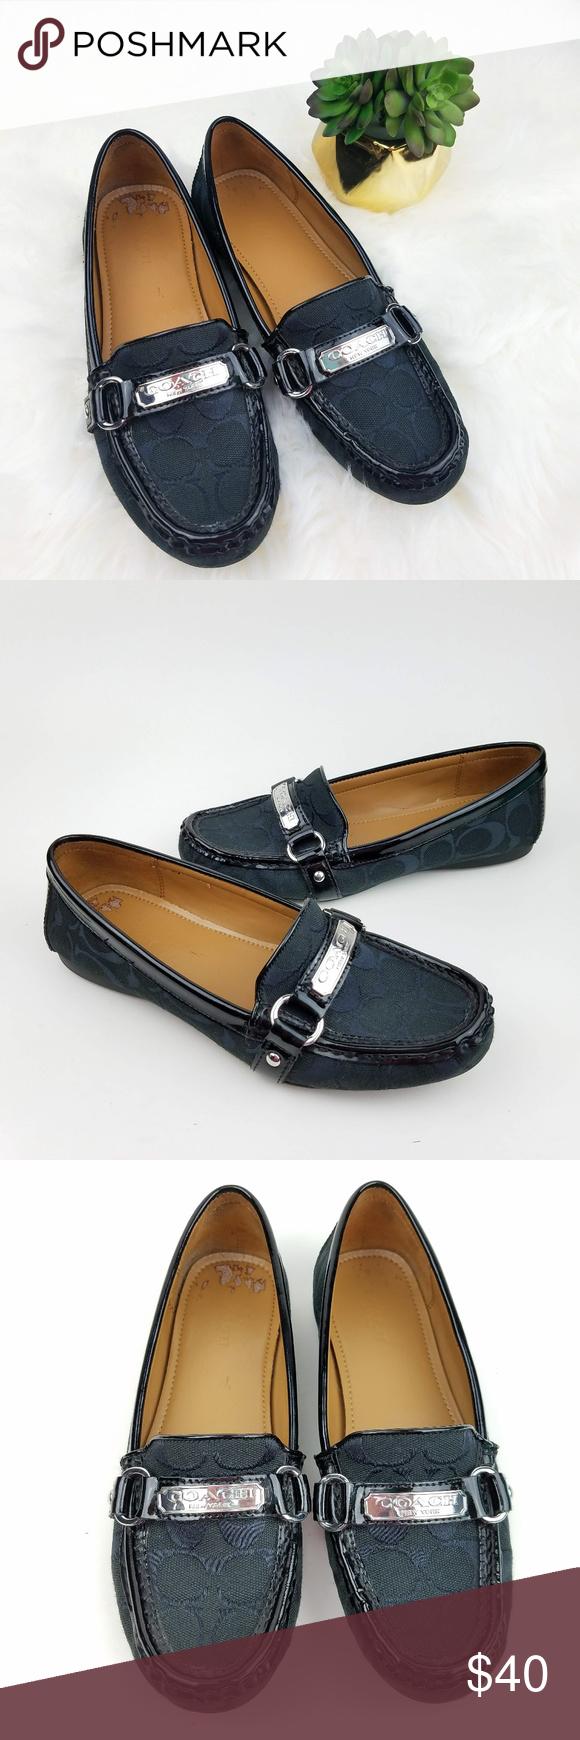 ed581fcfe92 COACH Felisha Black Jacquard   Patent Loafers Women s Coach Felisha Loafers  Black Upper done in Jacquard   Patent trim US Size 7.5B (medium) Pre-owned  in ...